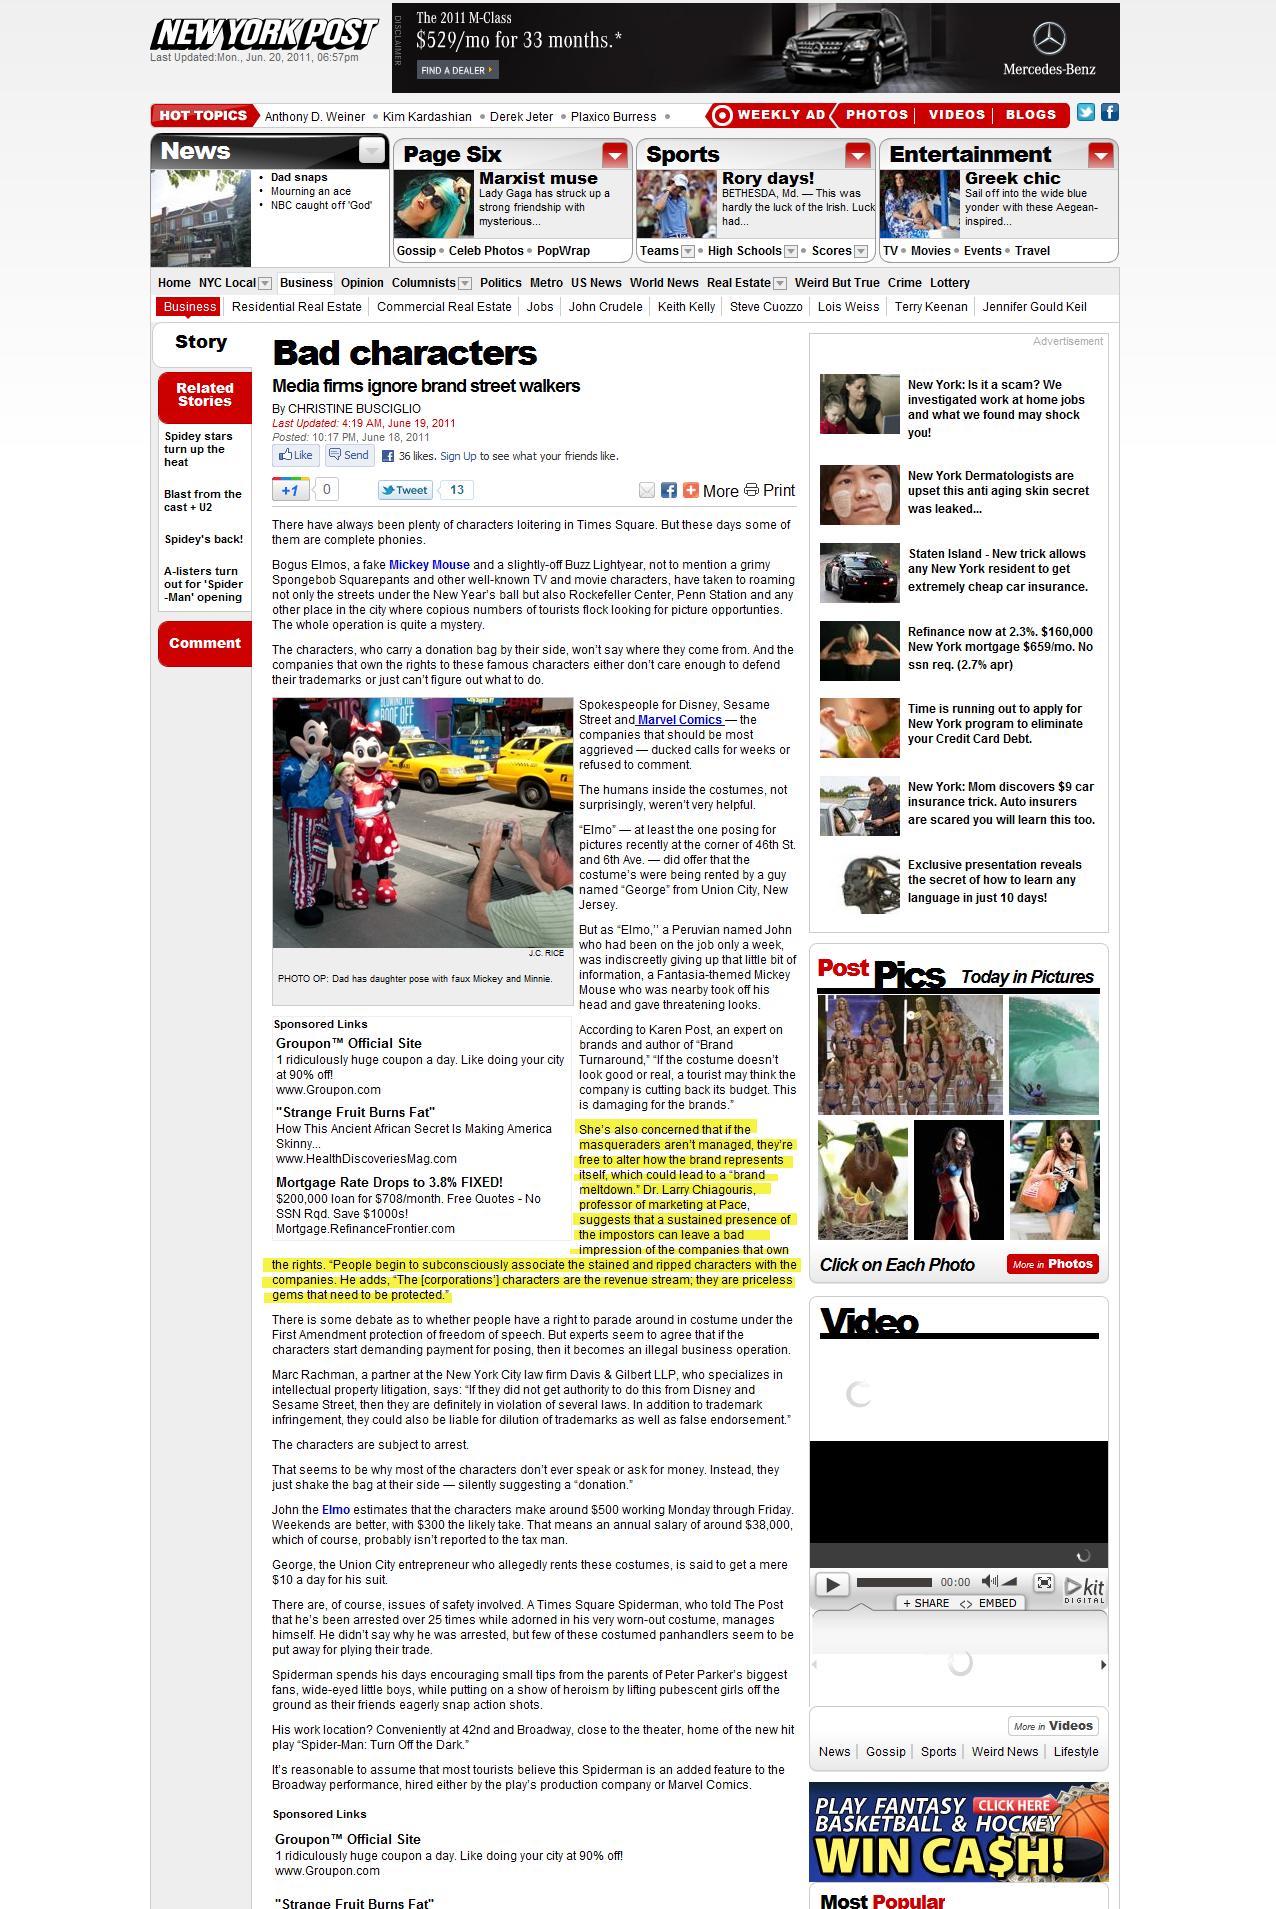 Bad Characters–New York Post